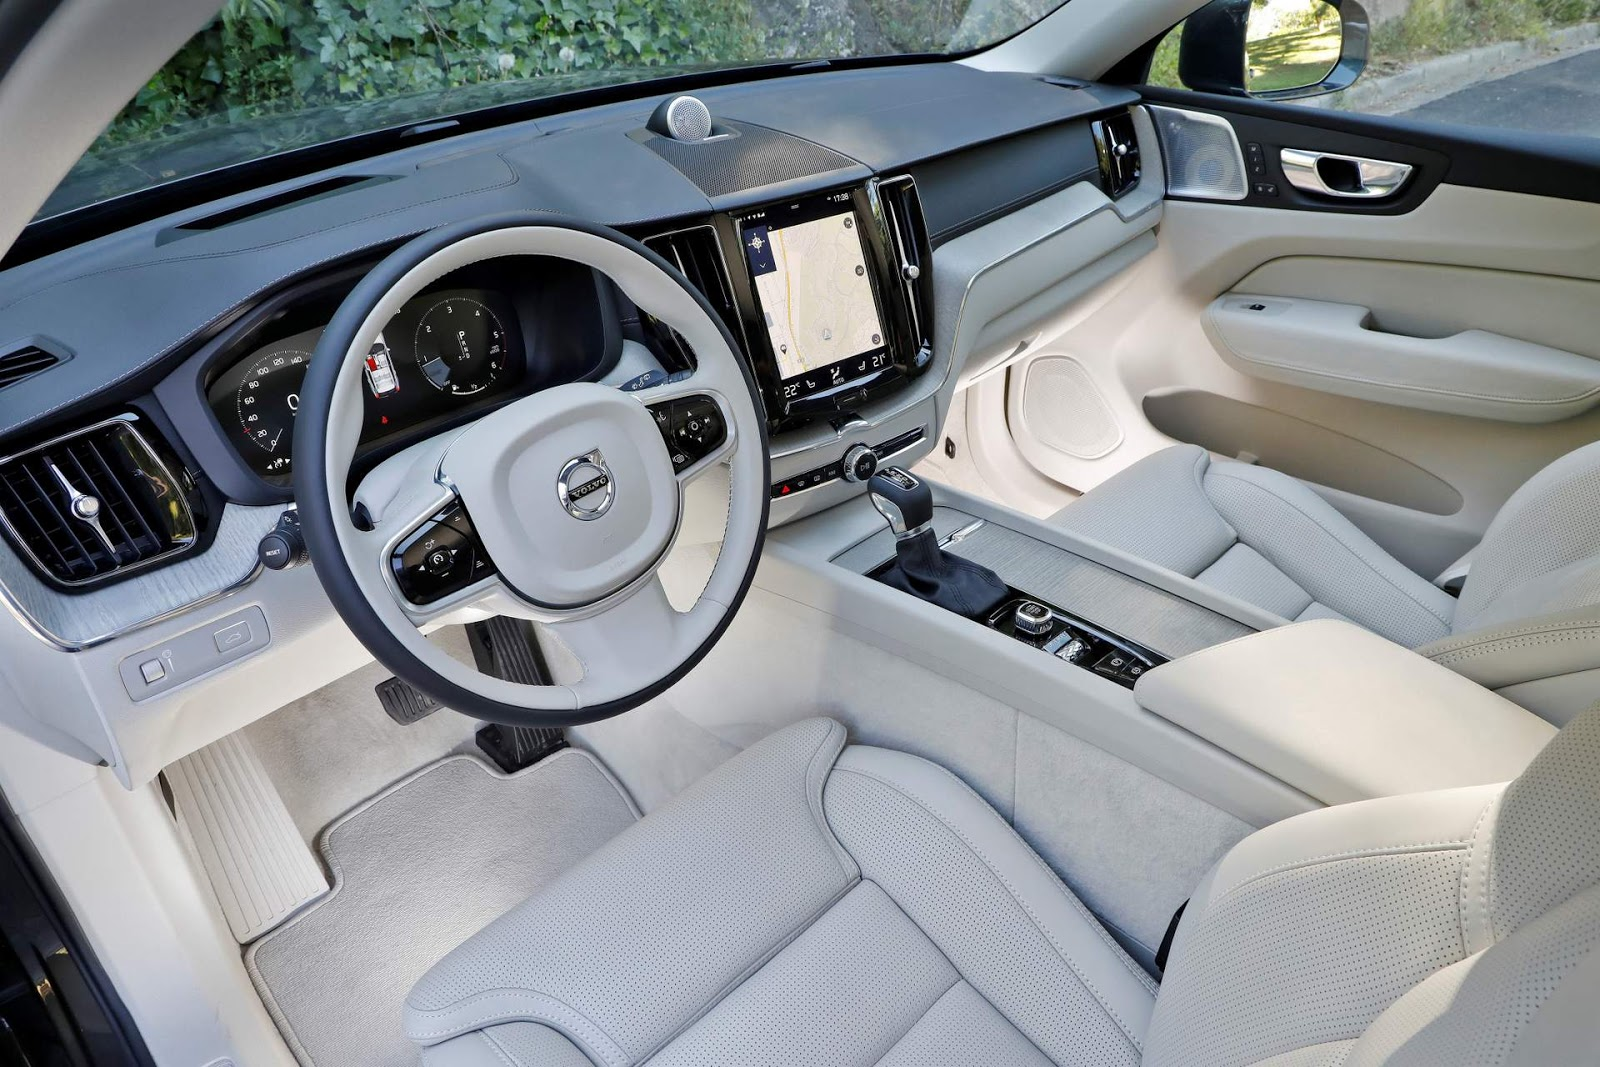 Volvo xc60 2018 pre os vers es e especifica es brasil for Volvo xc60 interieur